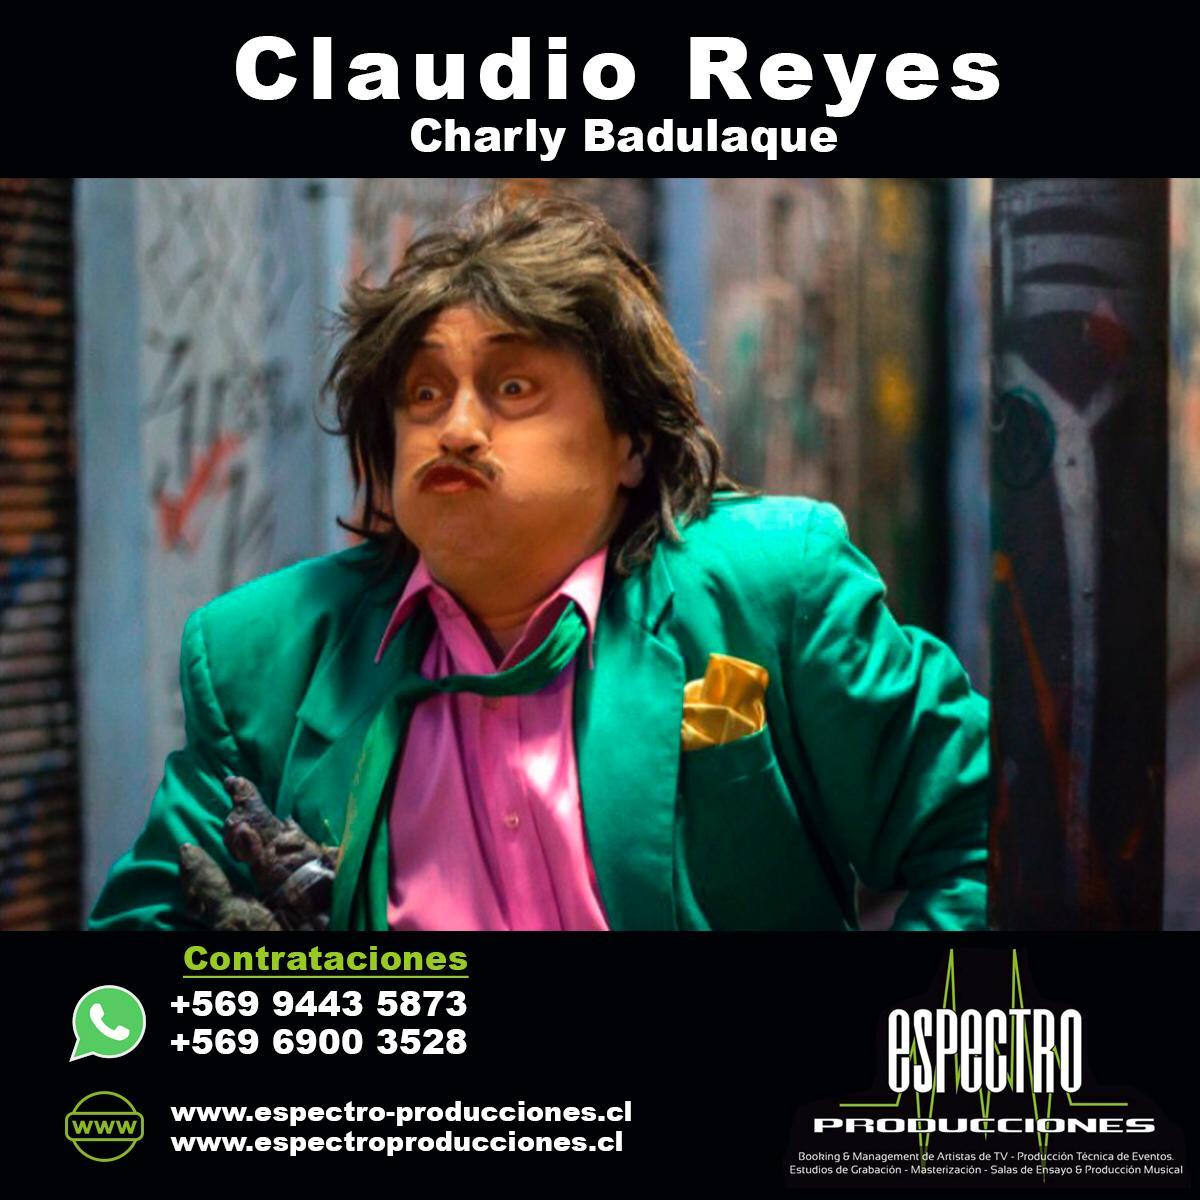 Claudio Reyes - Charly Badulaque